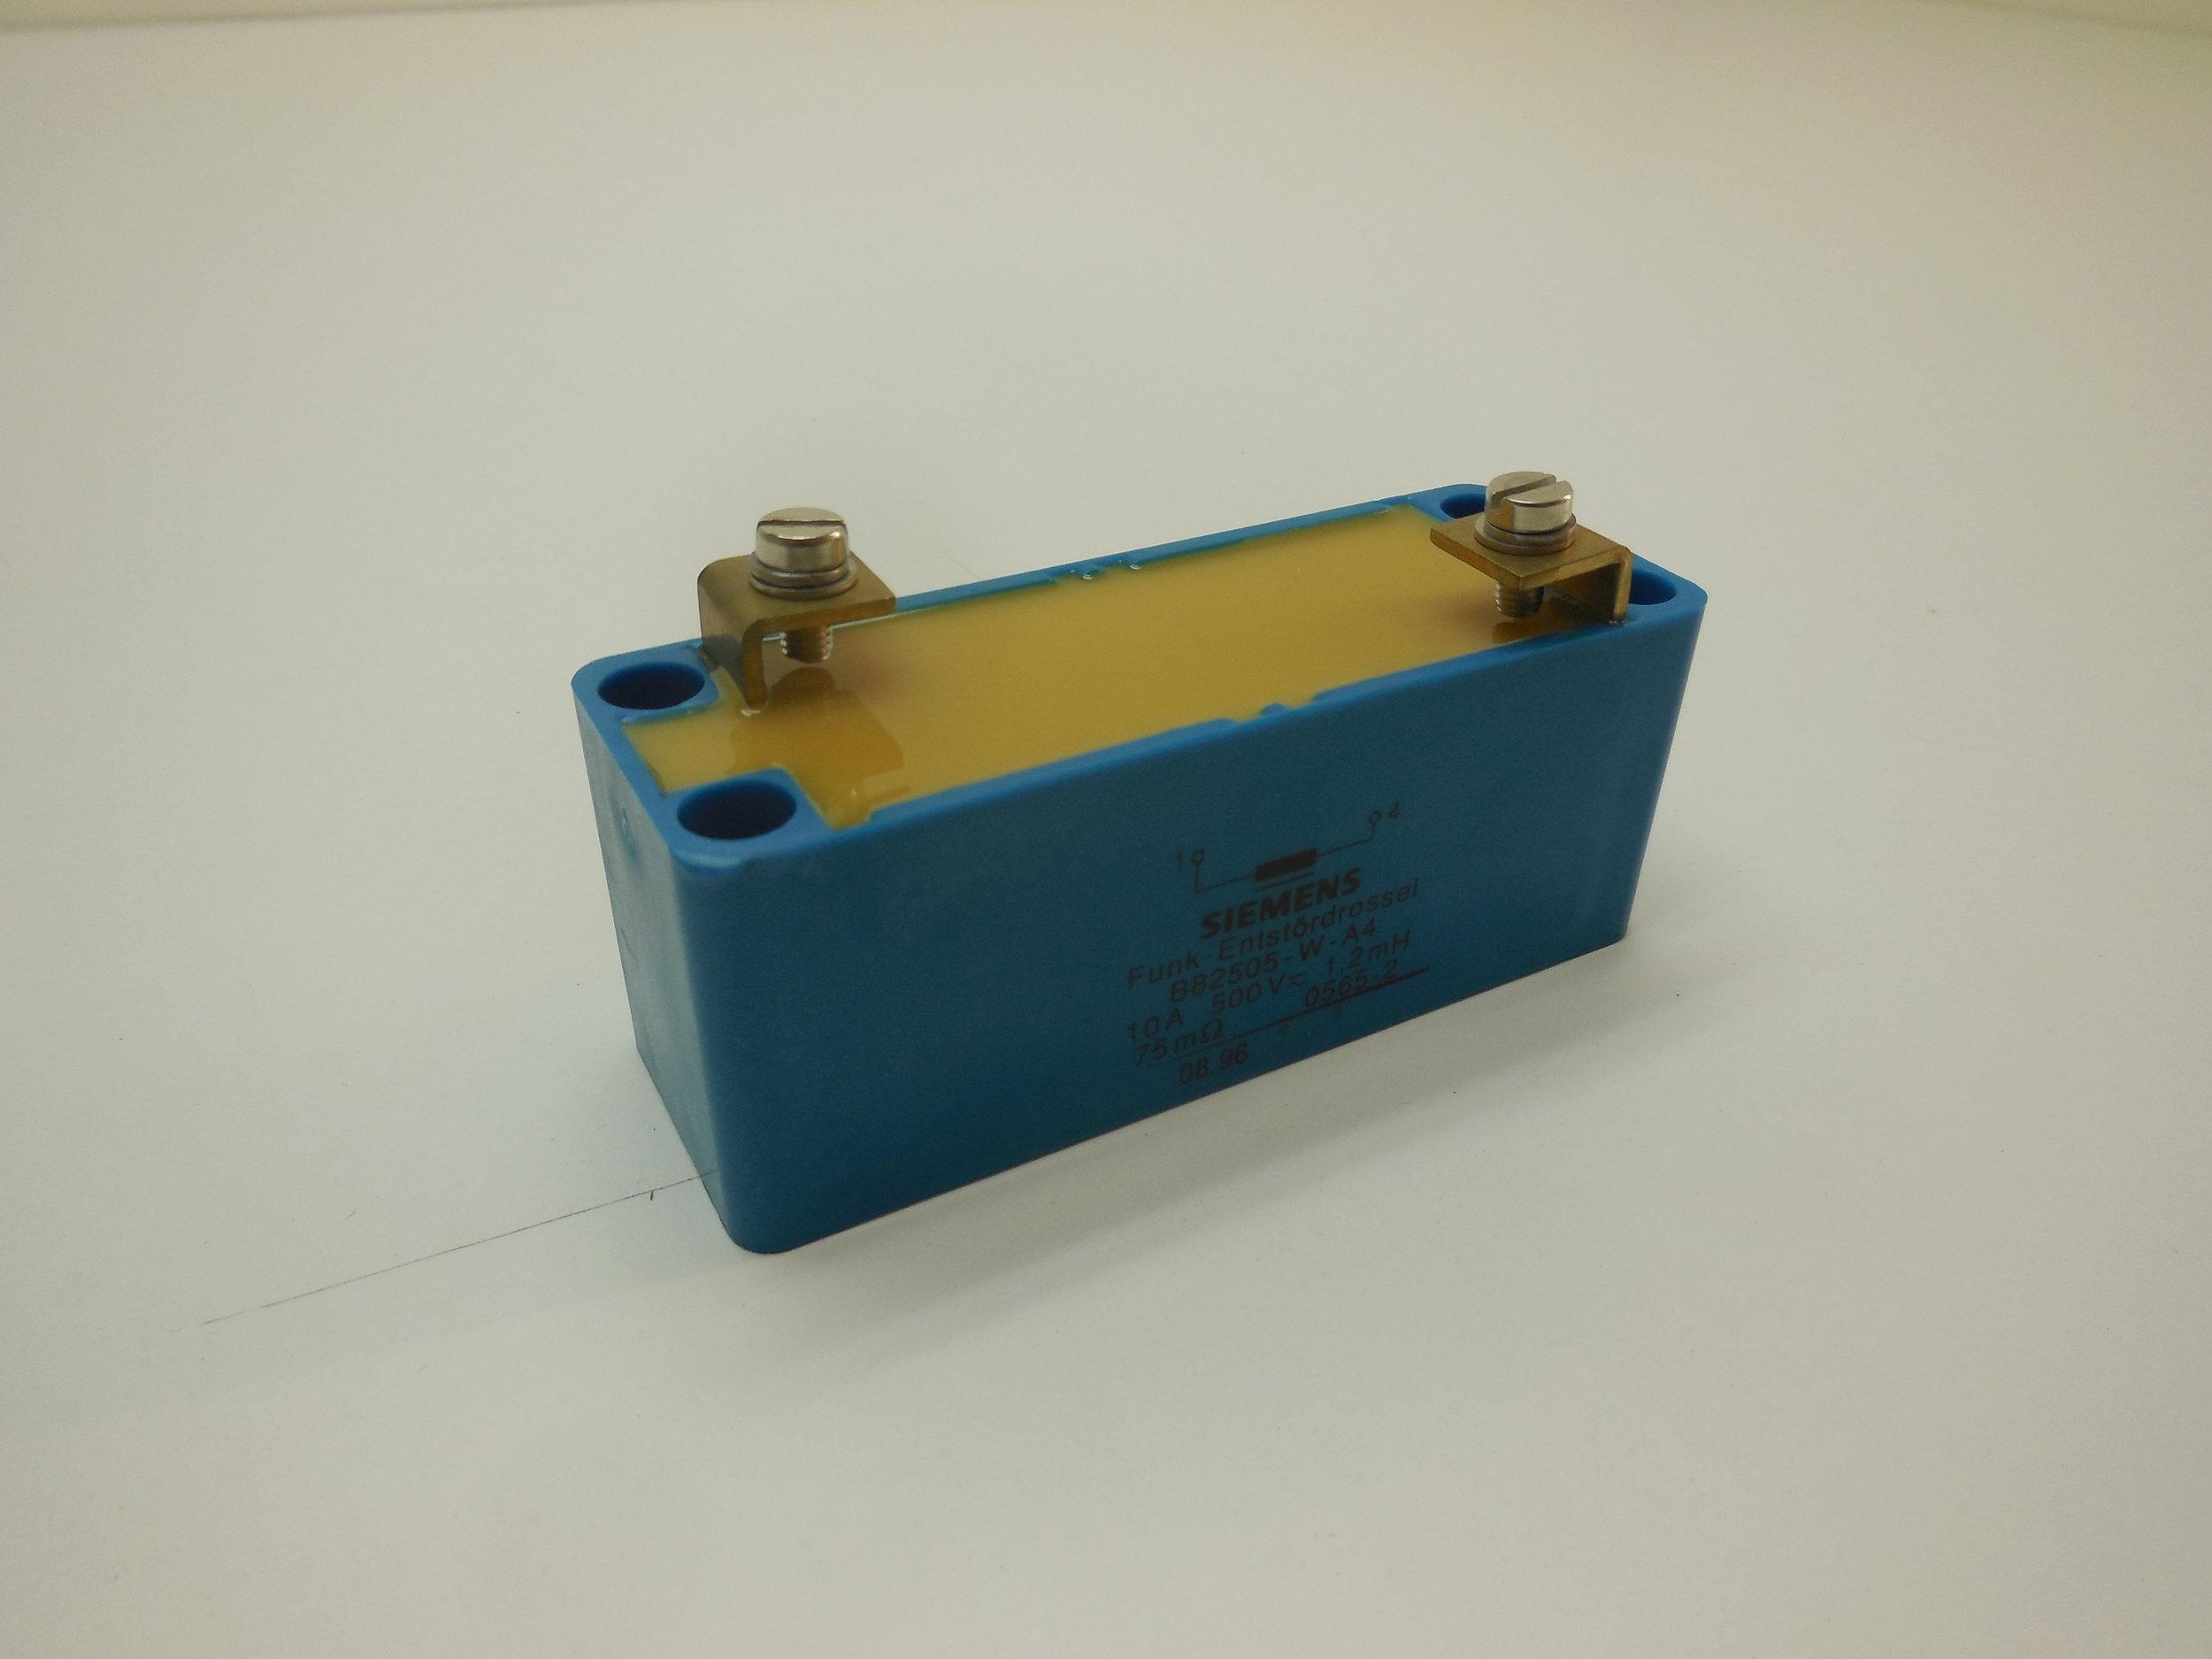 Choke coil   Siemens Nr: B82505-W-A4 Price: 130 Sek